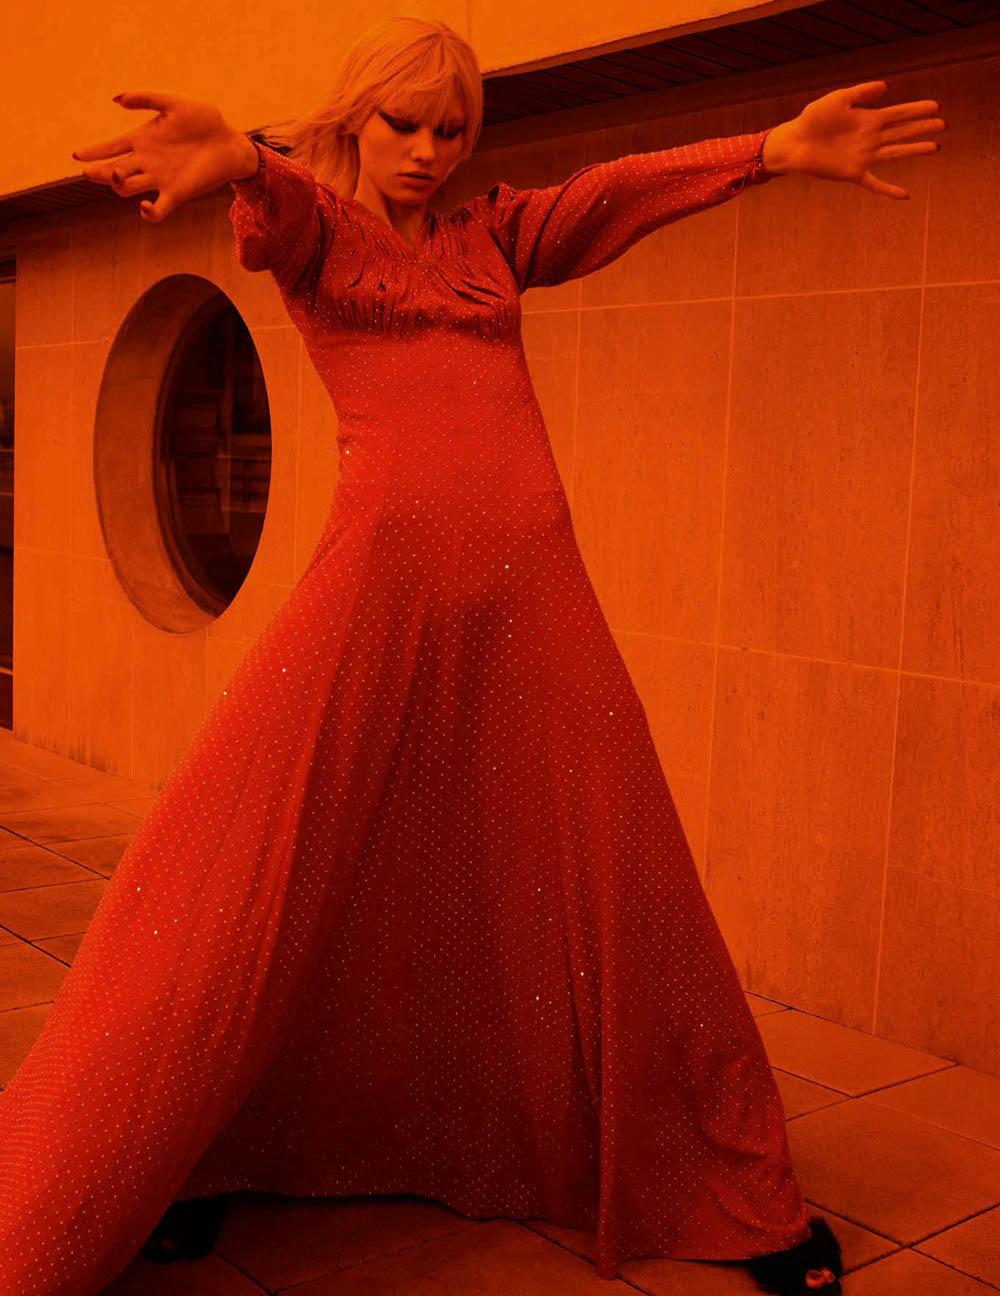 Vilma Sjöberg by Emma Summerton for Vogue Germany May 2020